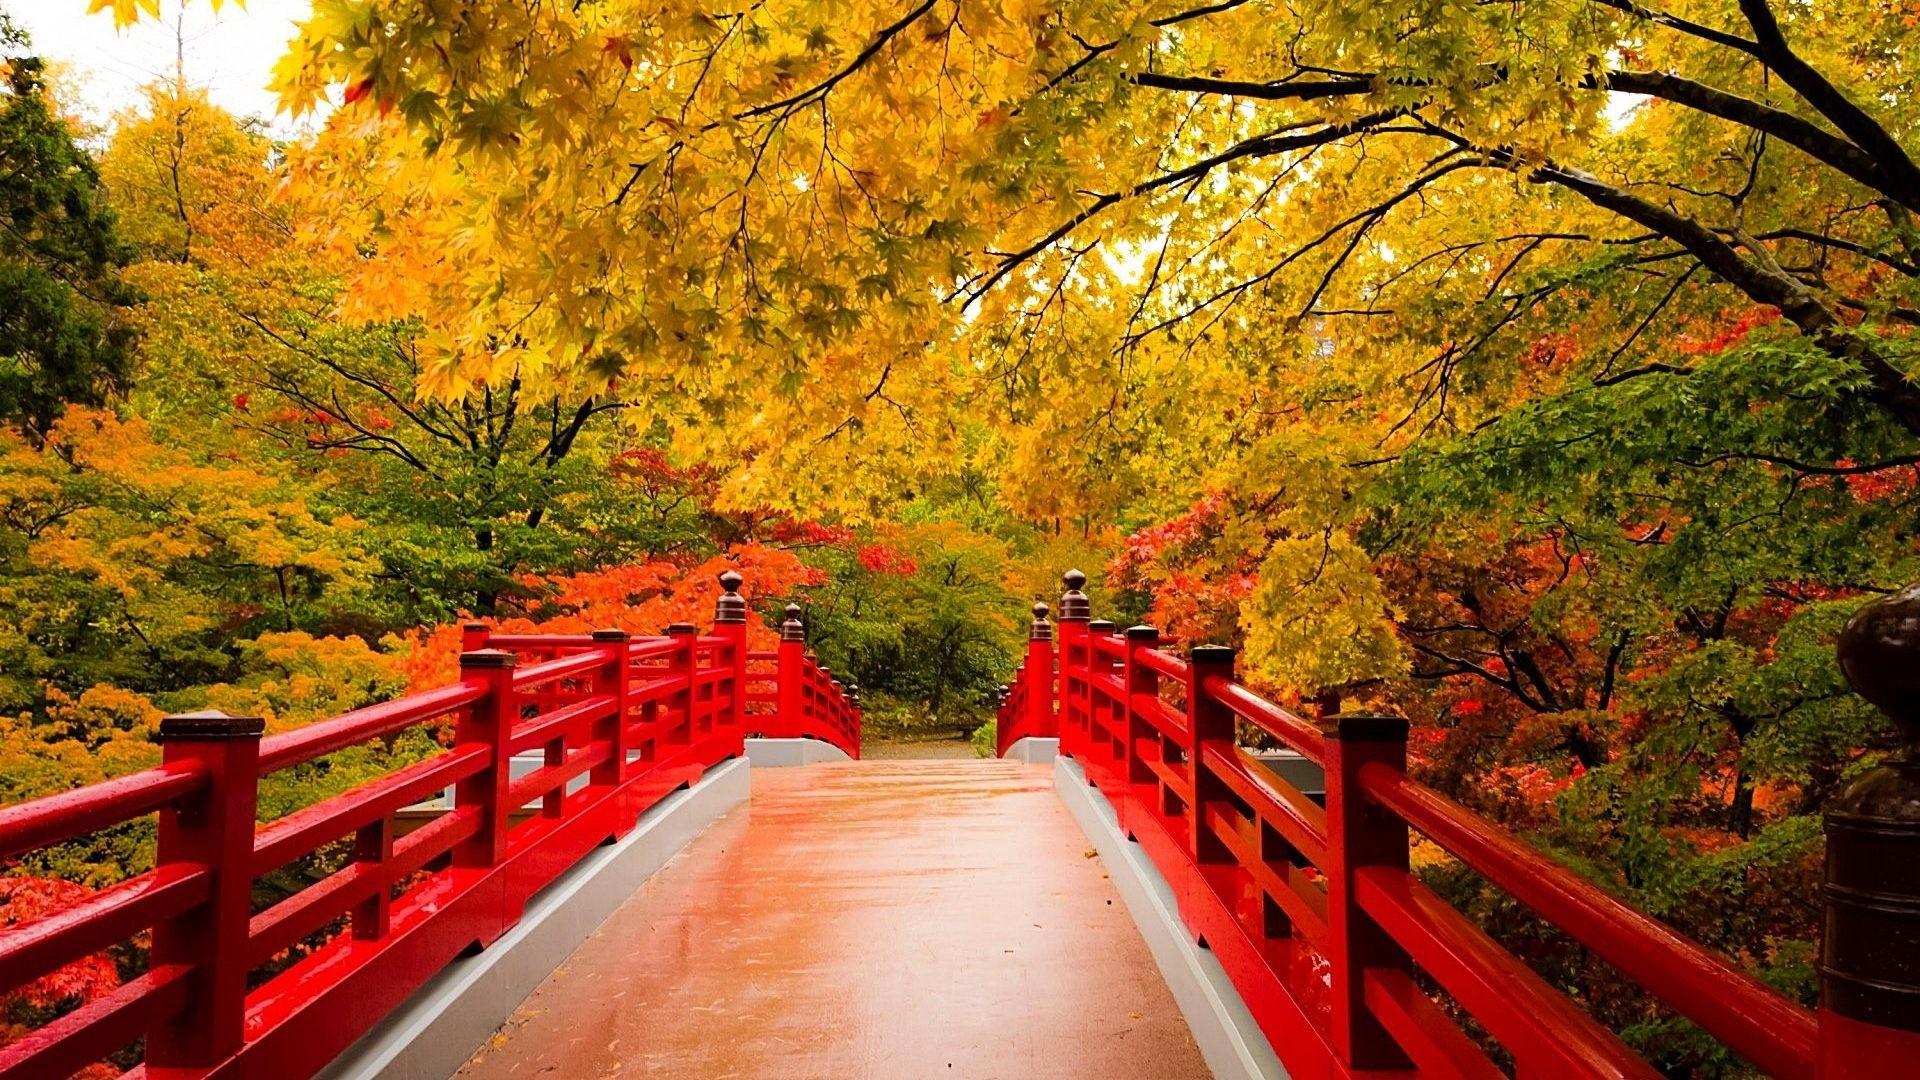 Autumn Screen Wallpaper (64+ images)